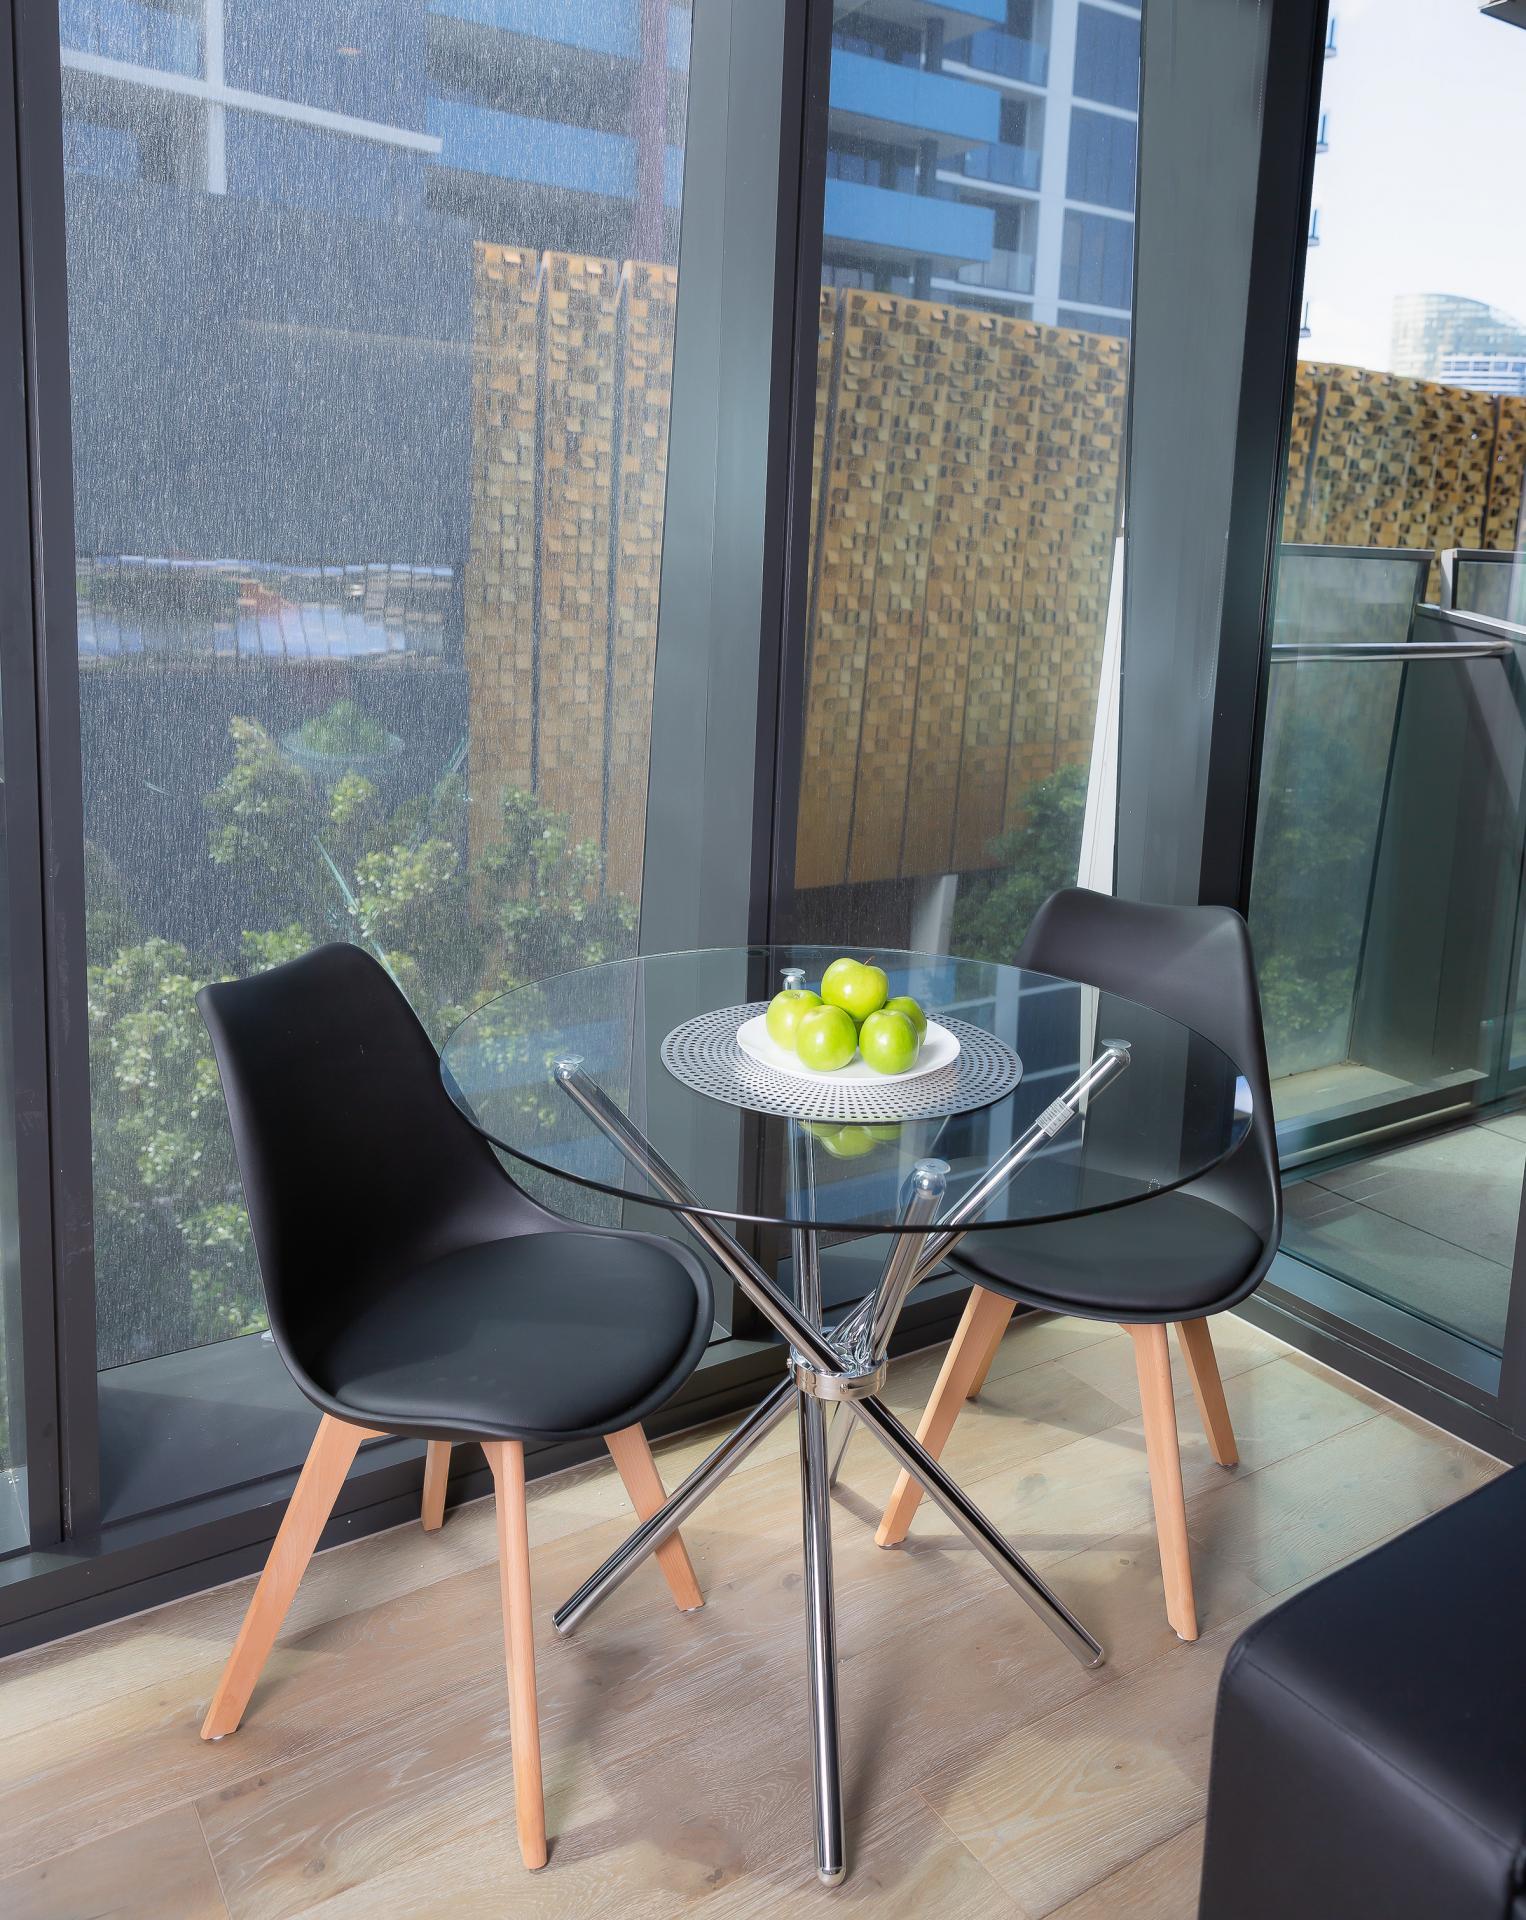 Dining table at Doepel Way Apartments